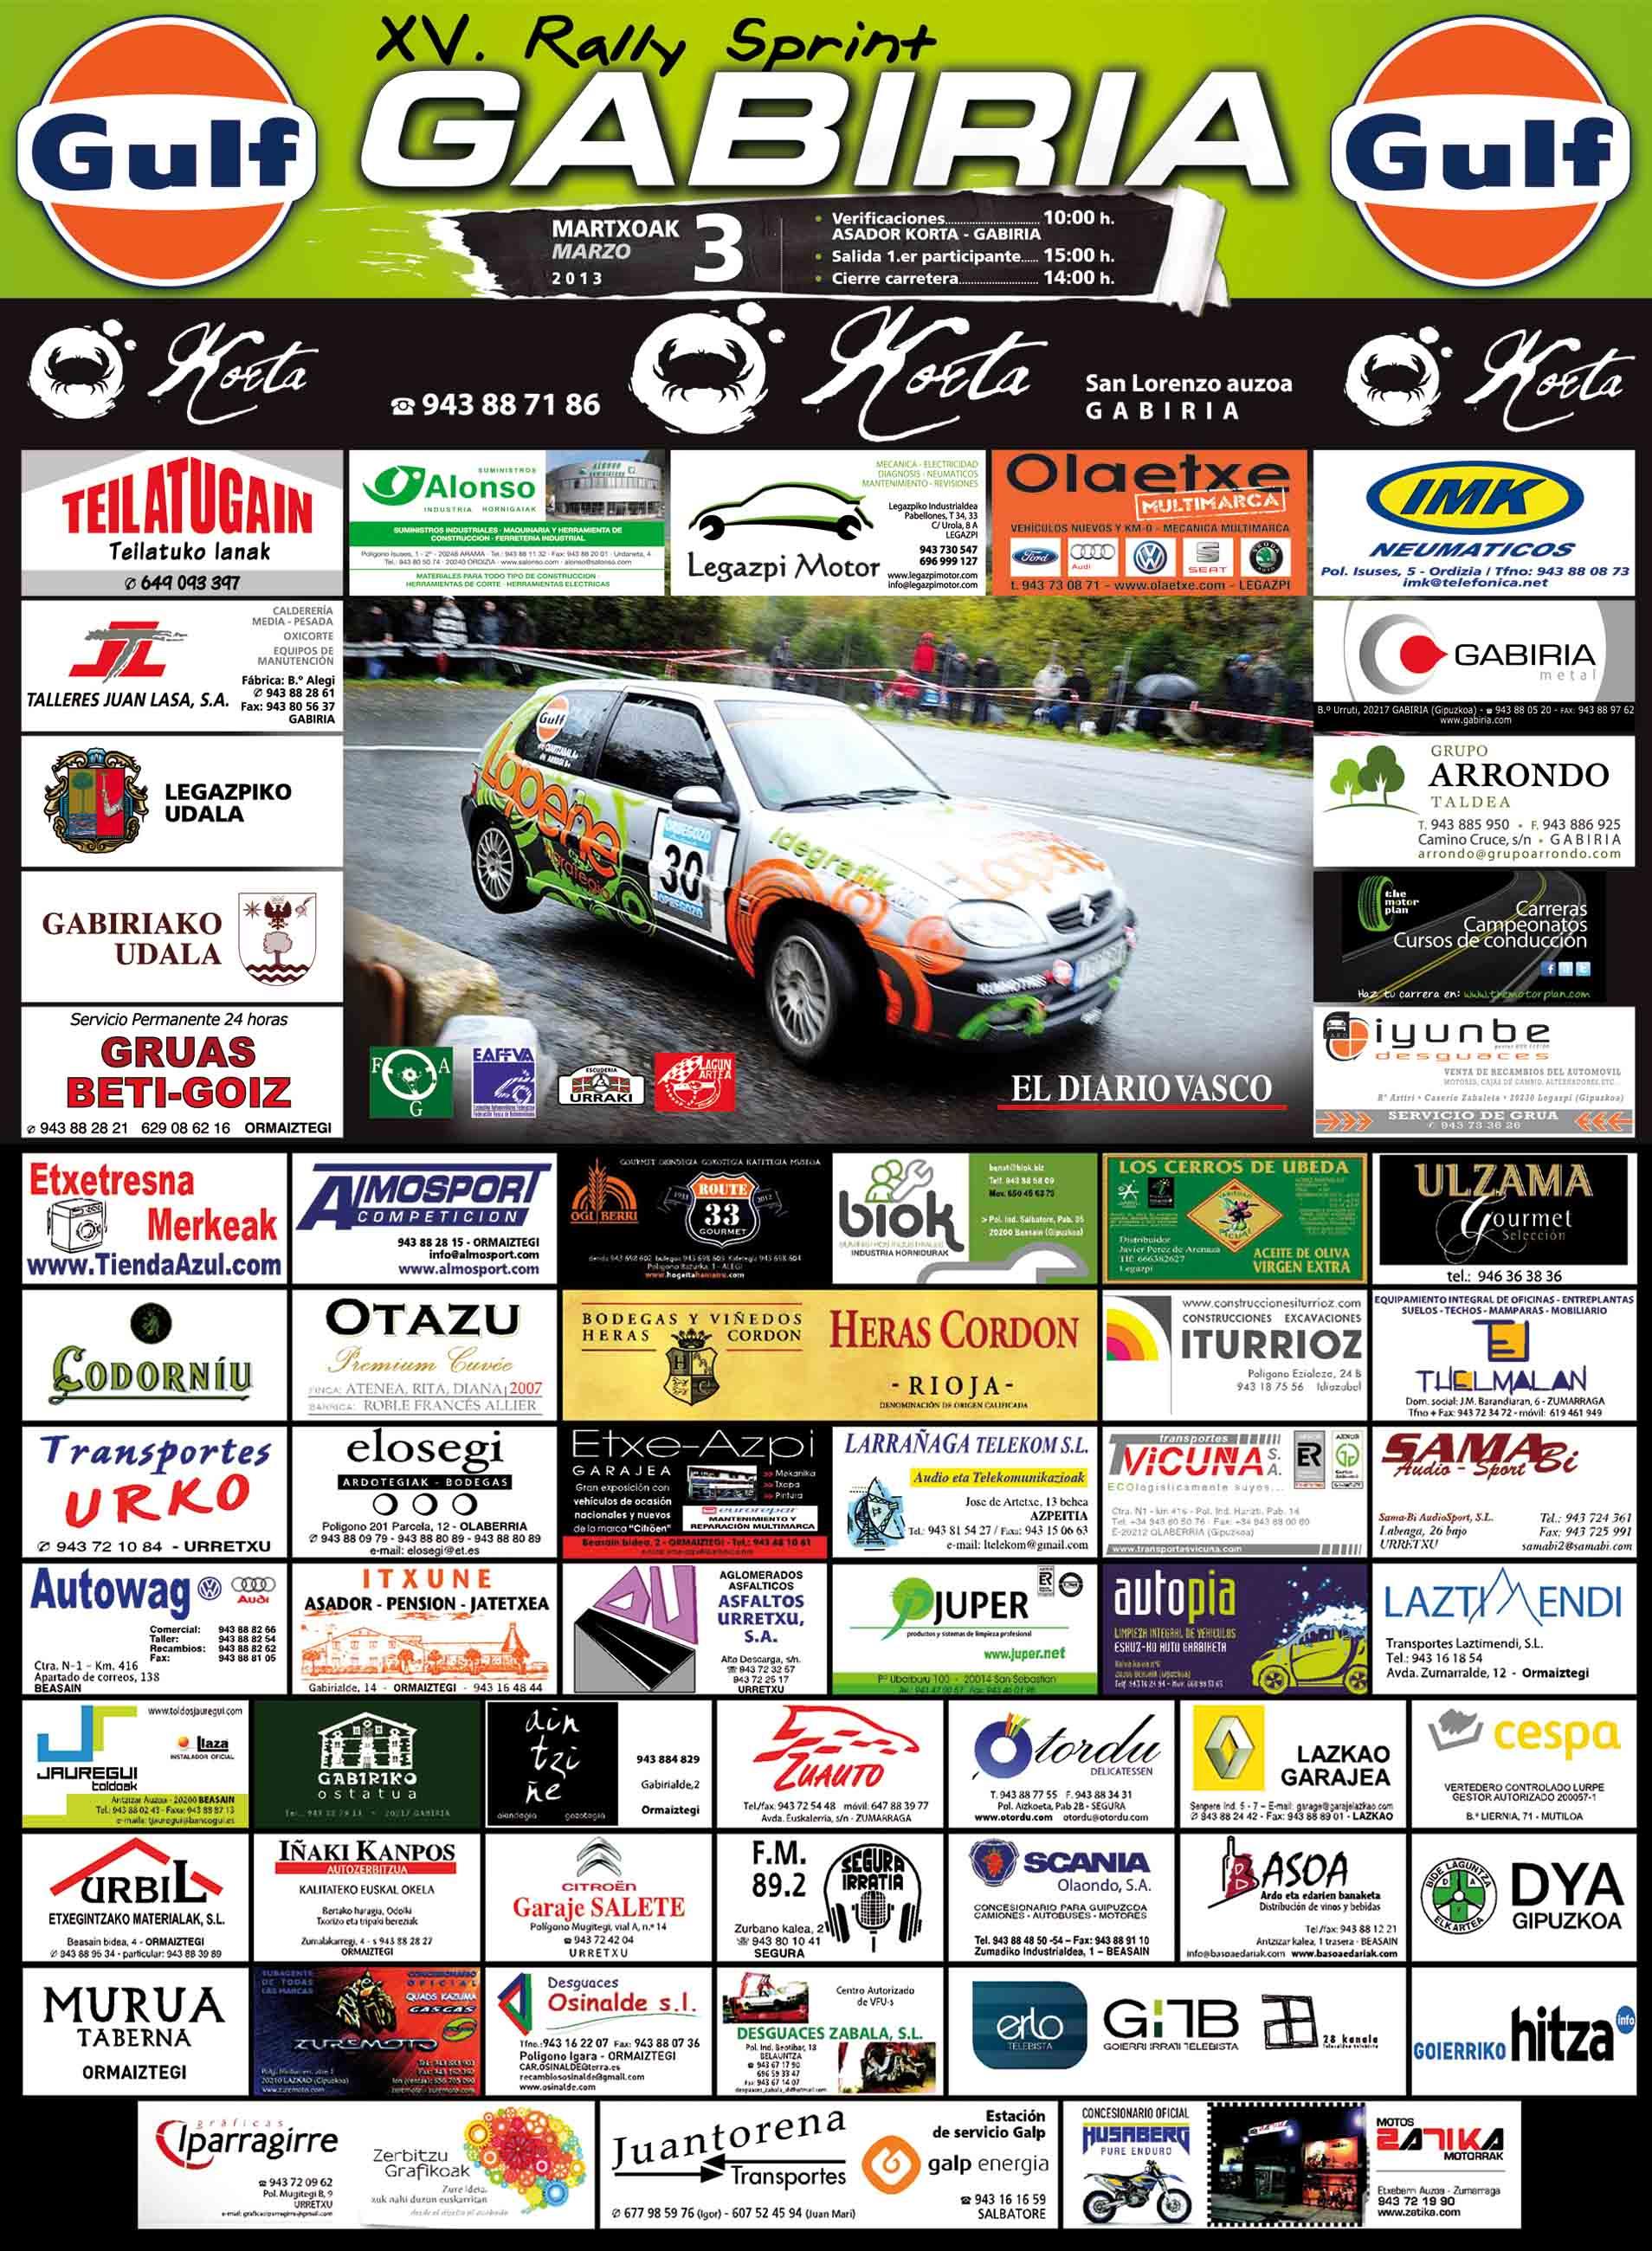 [PAIS VASCO] XV Rallysprint de Gabiria 2013 [3 de Marzo] Gabiri13